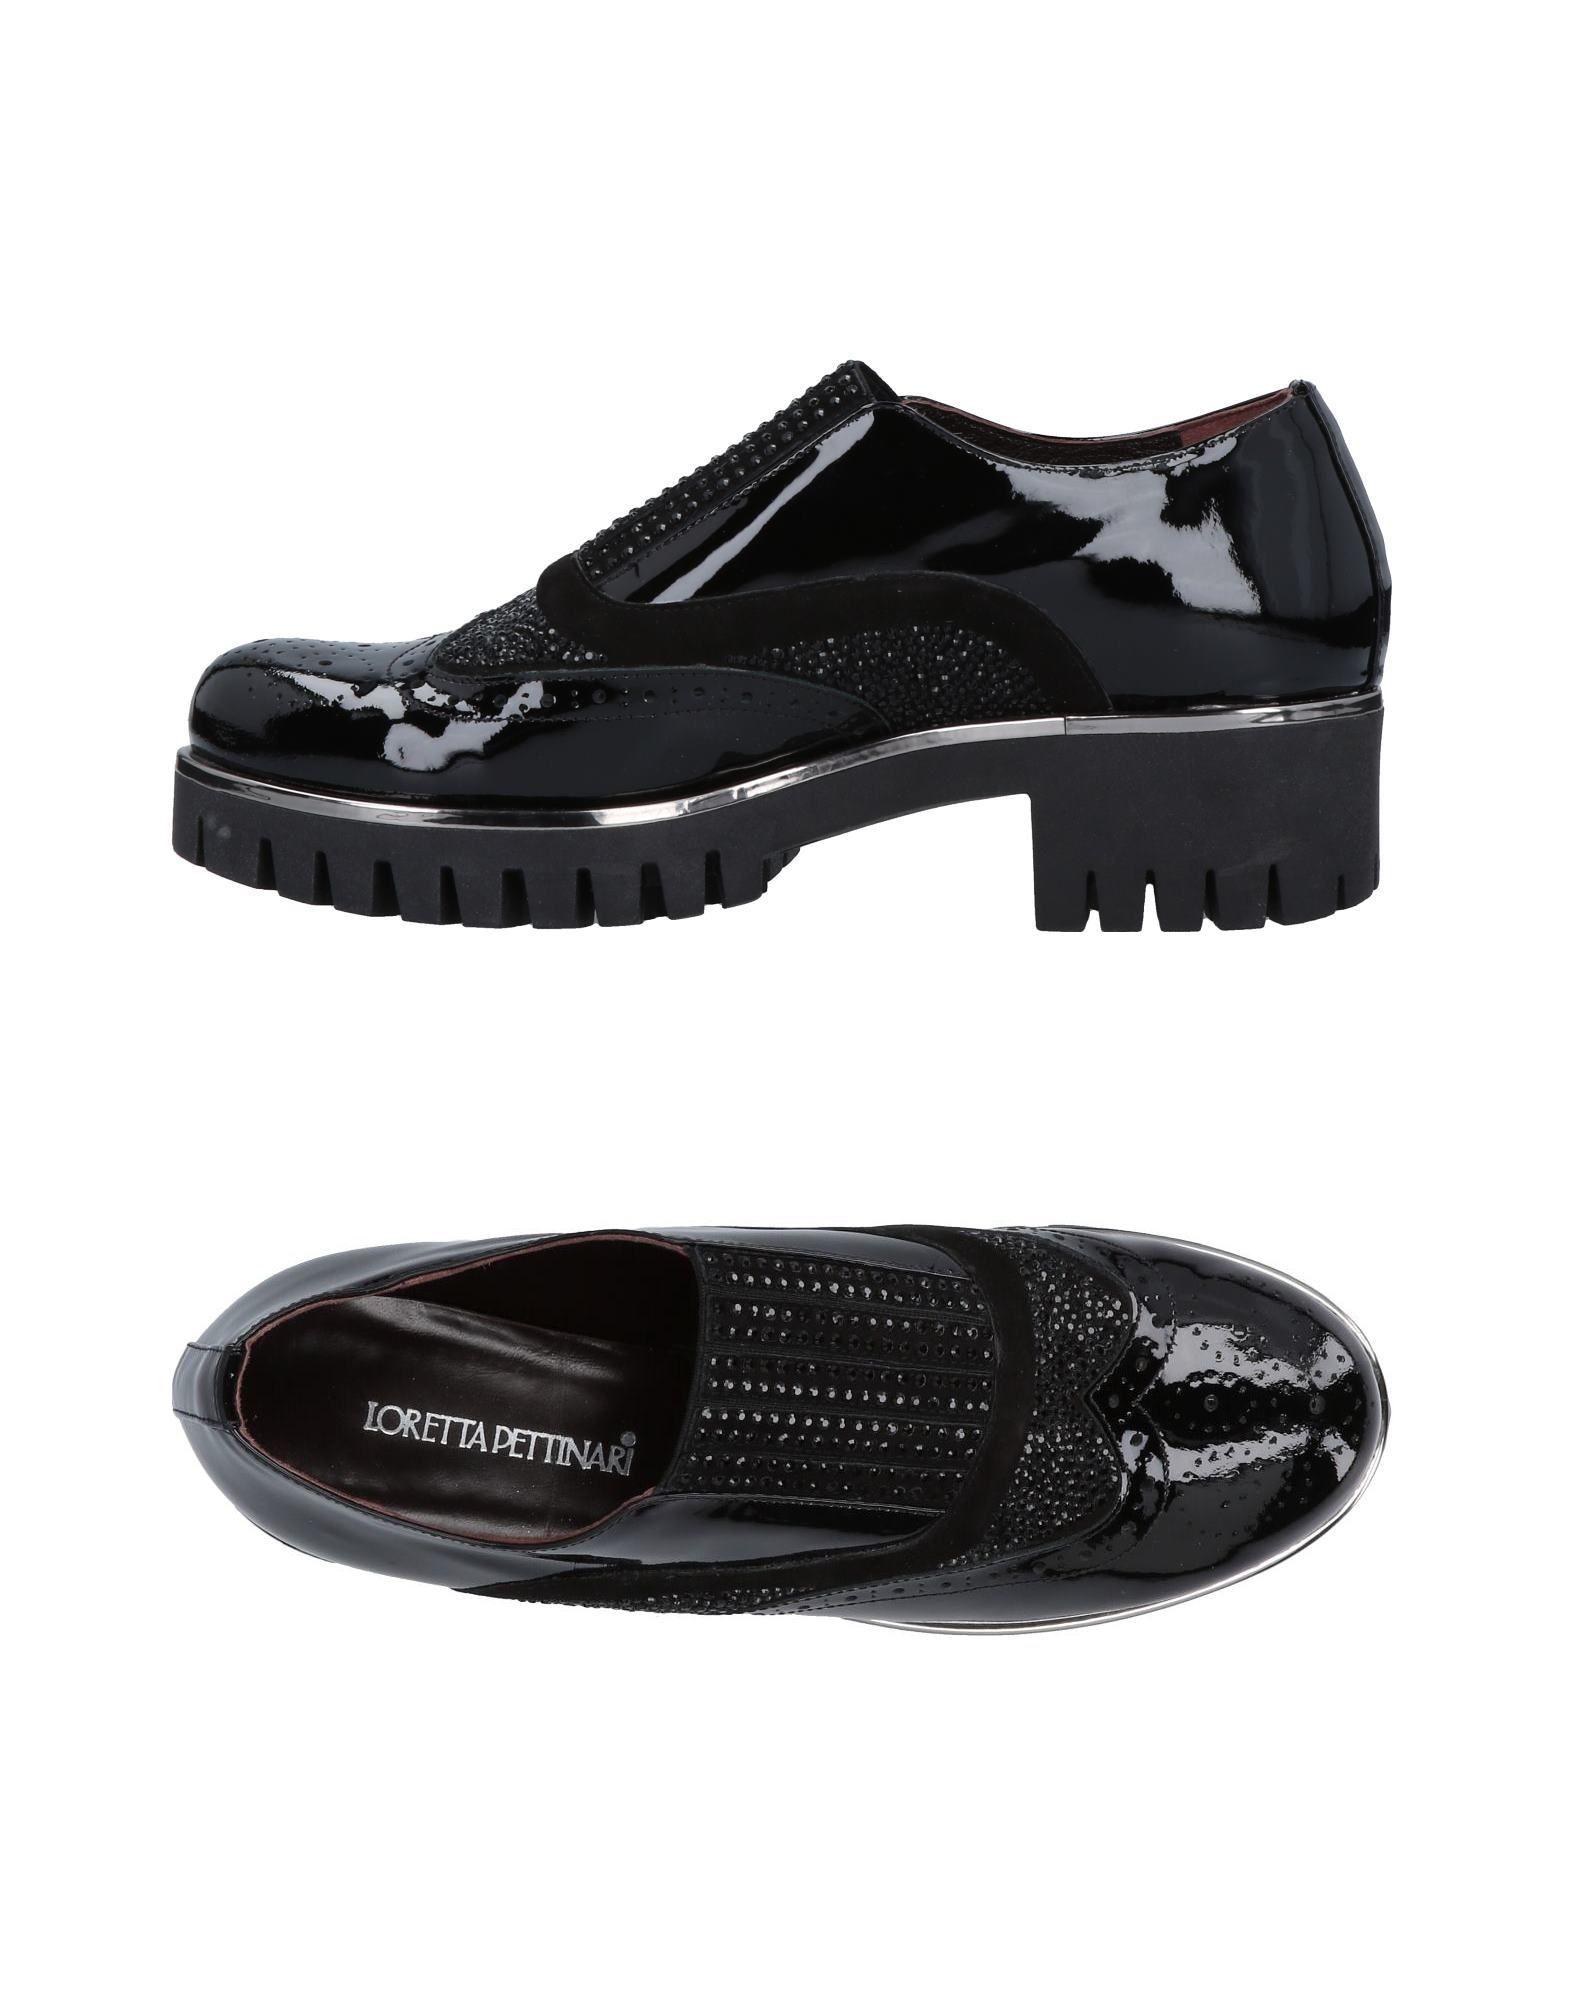 Loretta Pettinari Mokassins aussehende Damen  11494138LKGut aussehende Mokassins strapazierfähige Schuhe f0e010